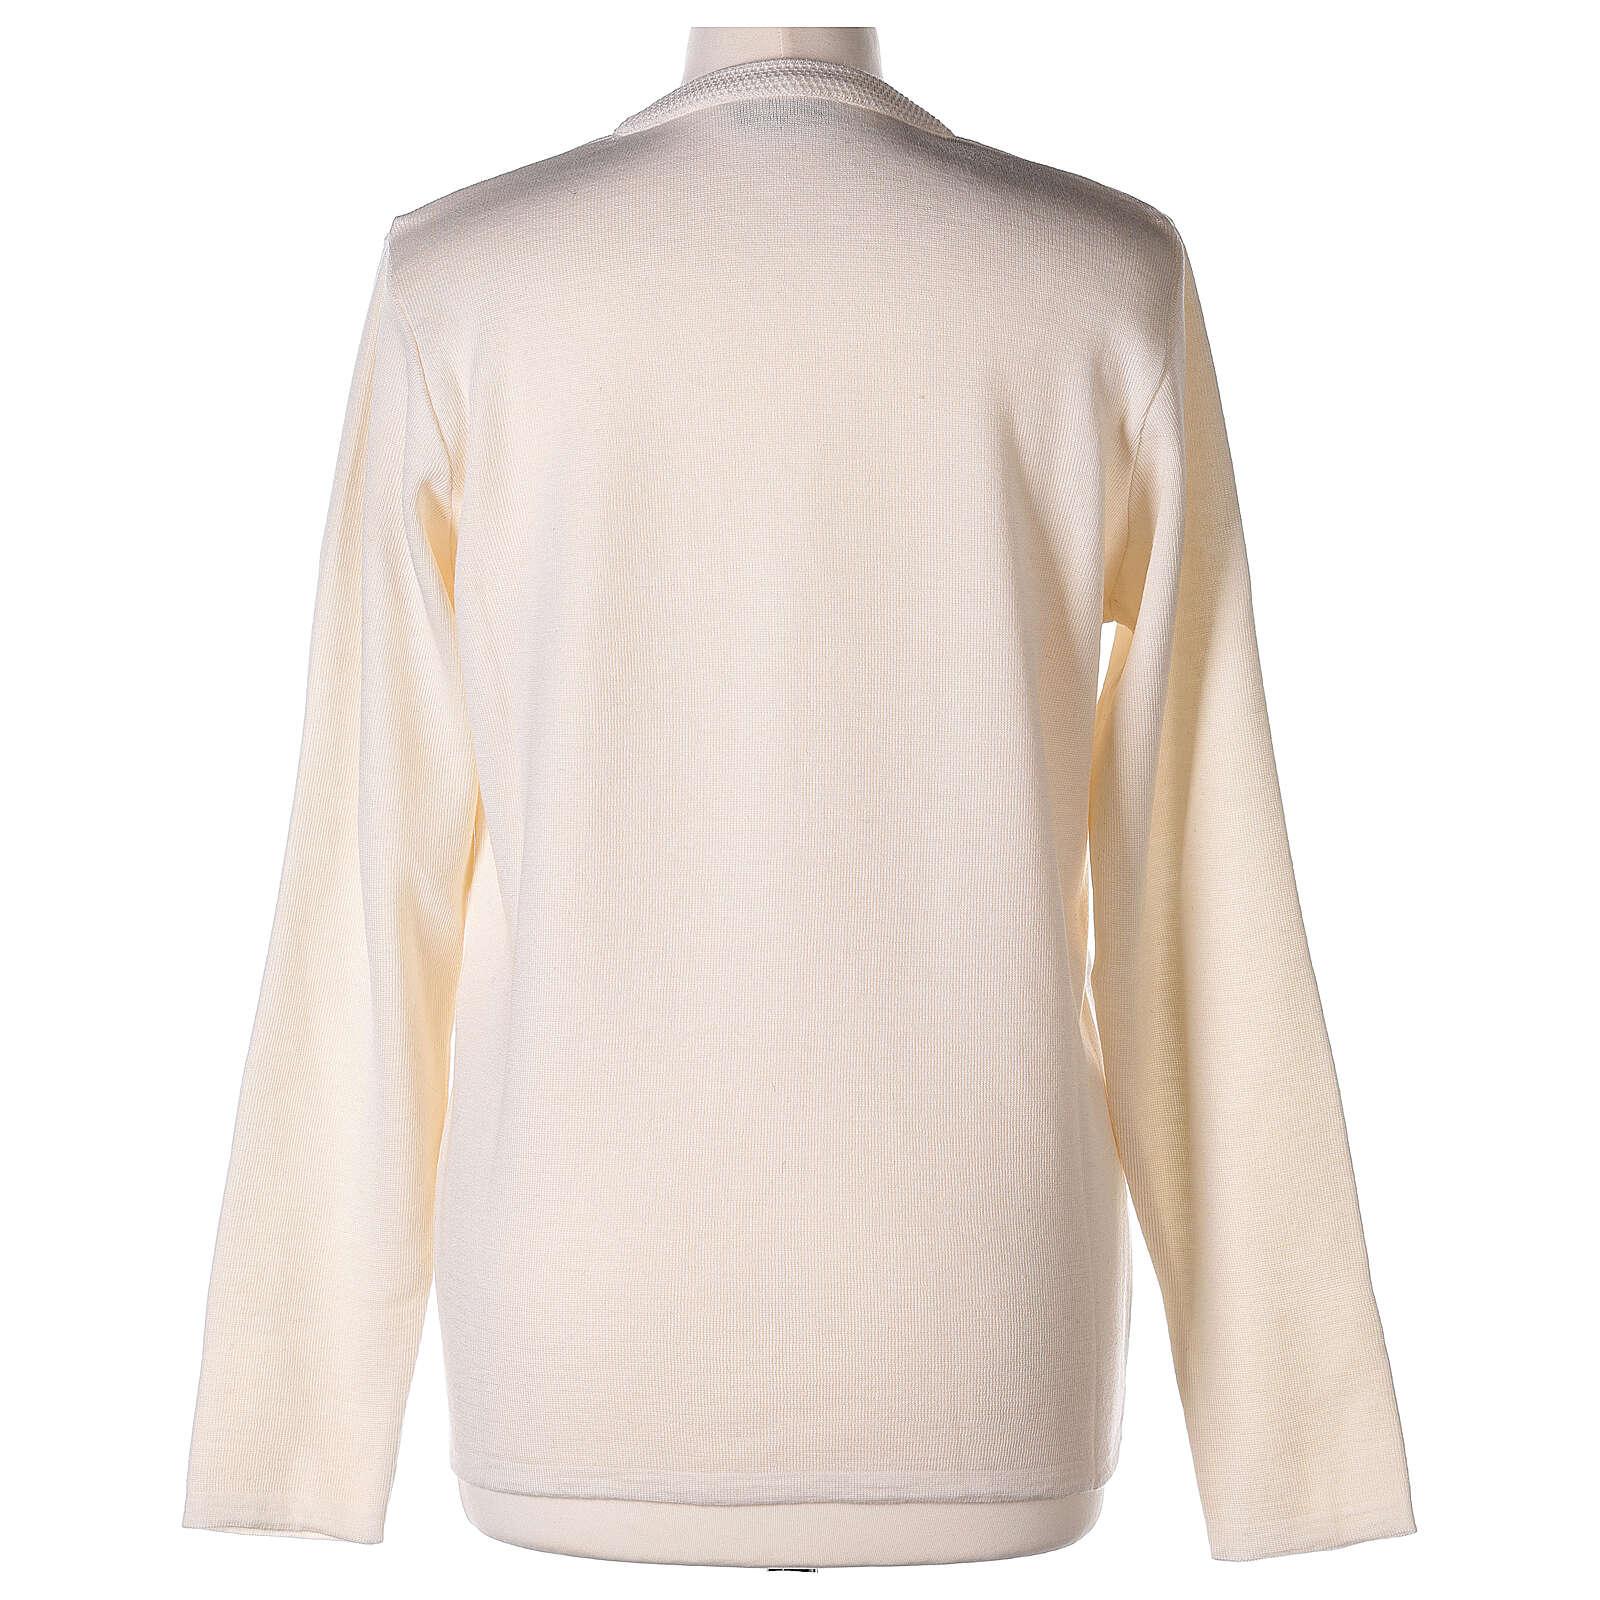 Nun white V-neck cardigan with pockets PLUS SIZES 50% merino wool 50% acrylic In Primis 4